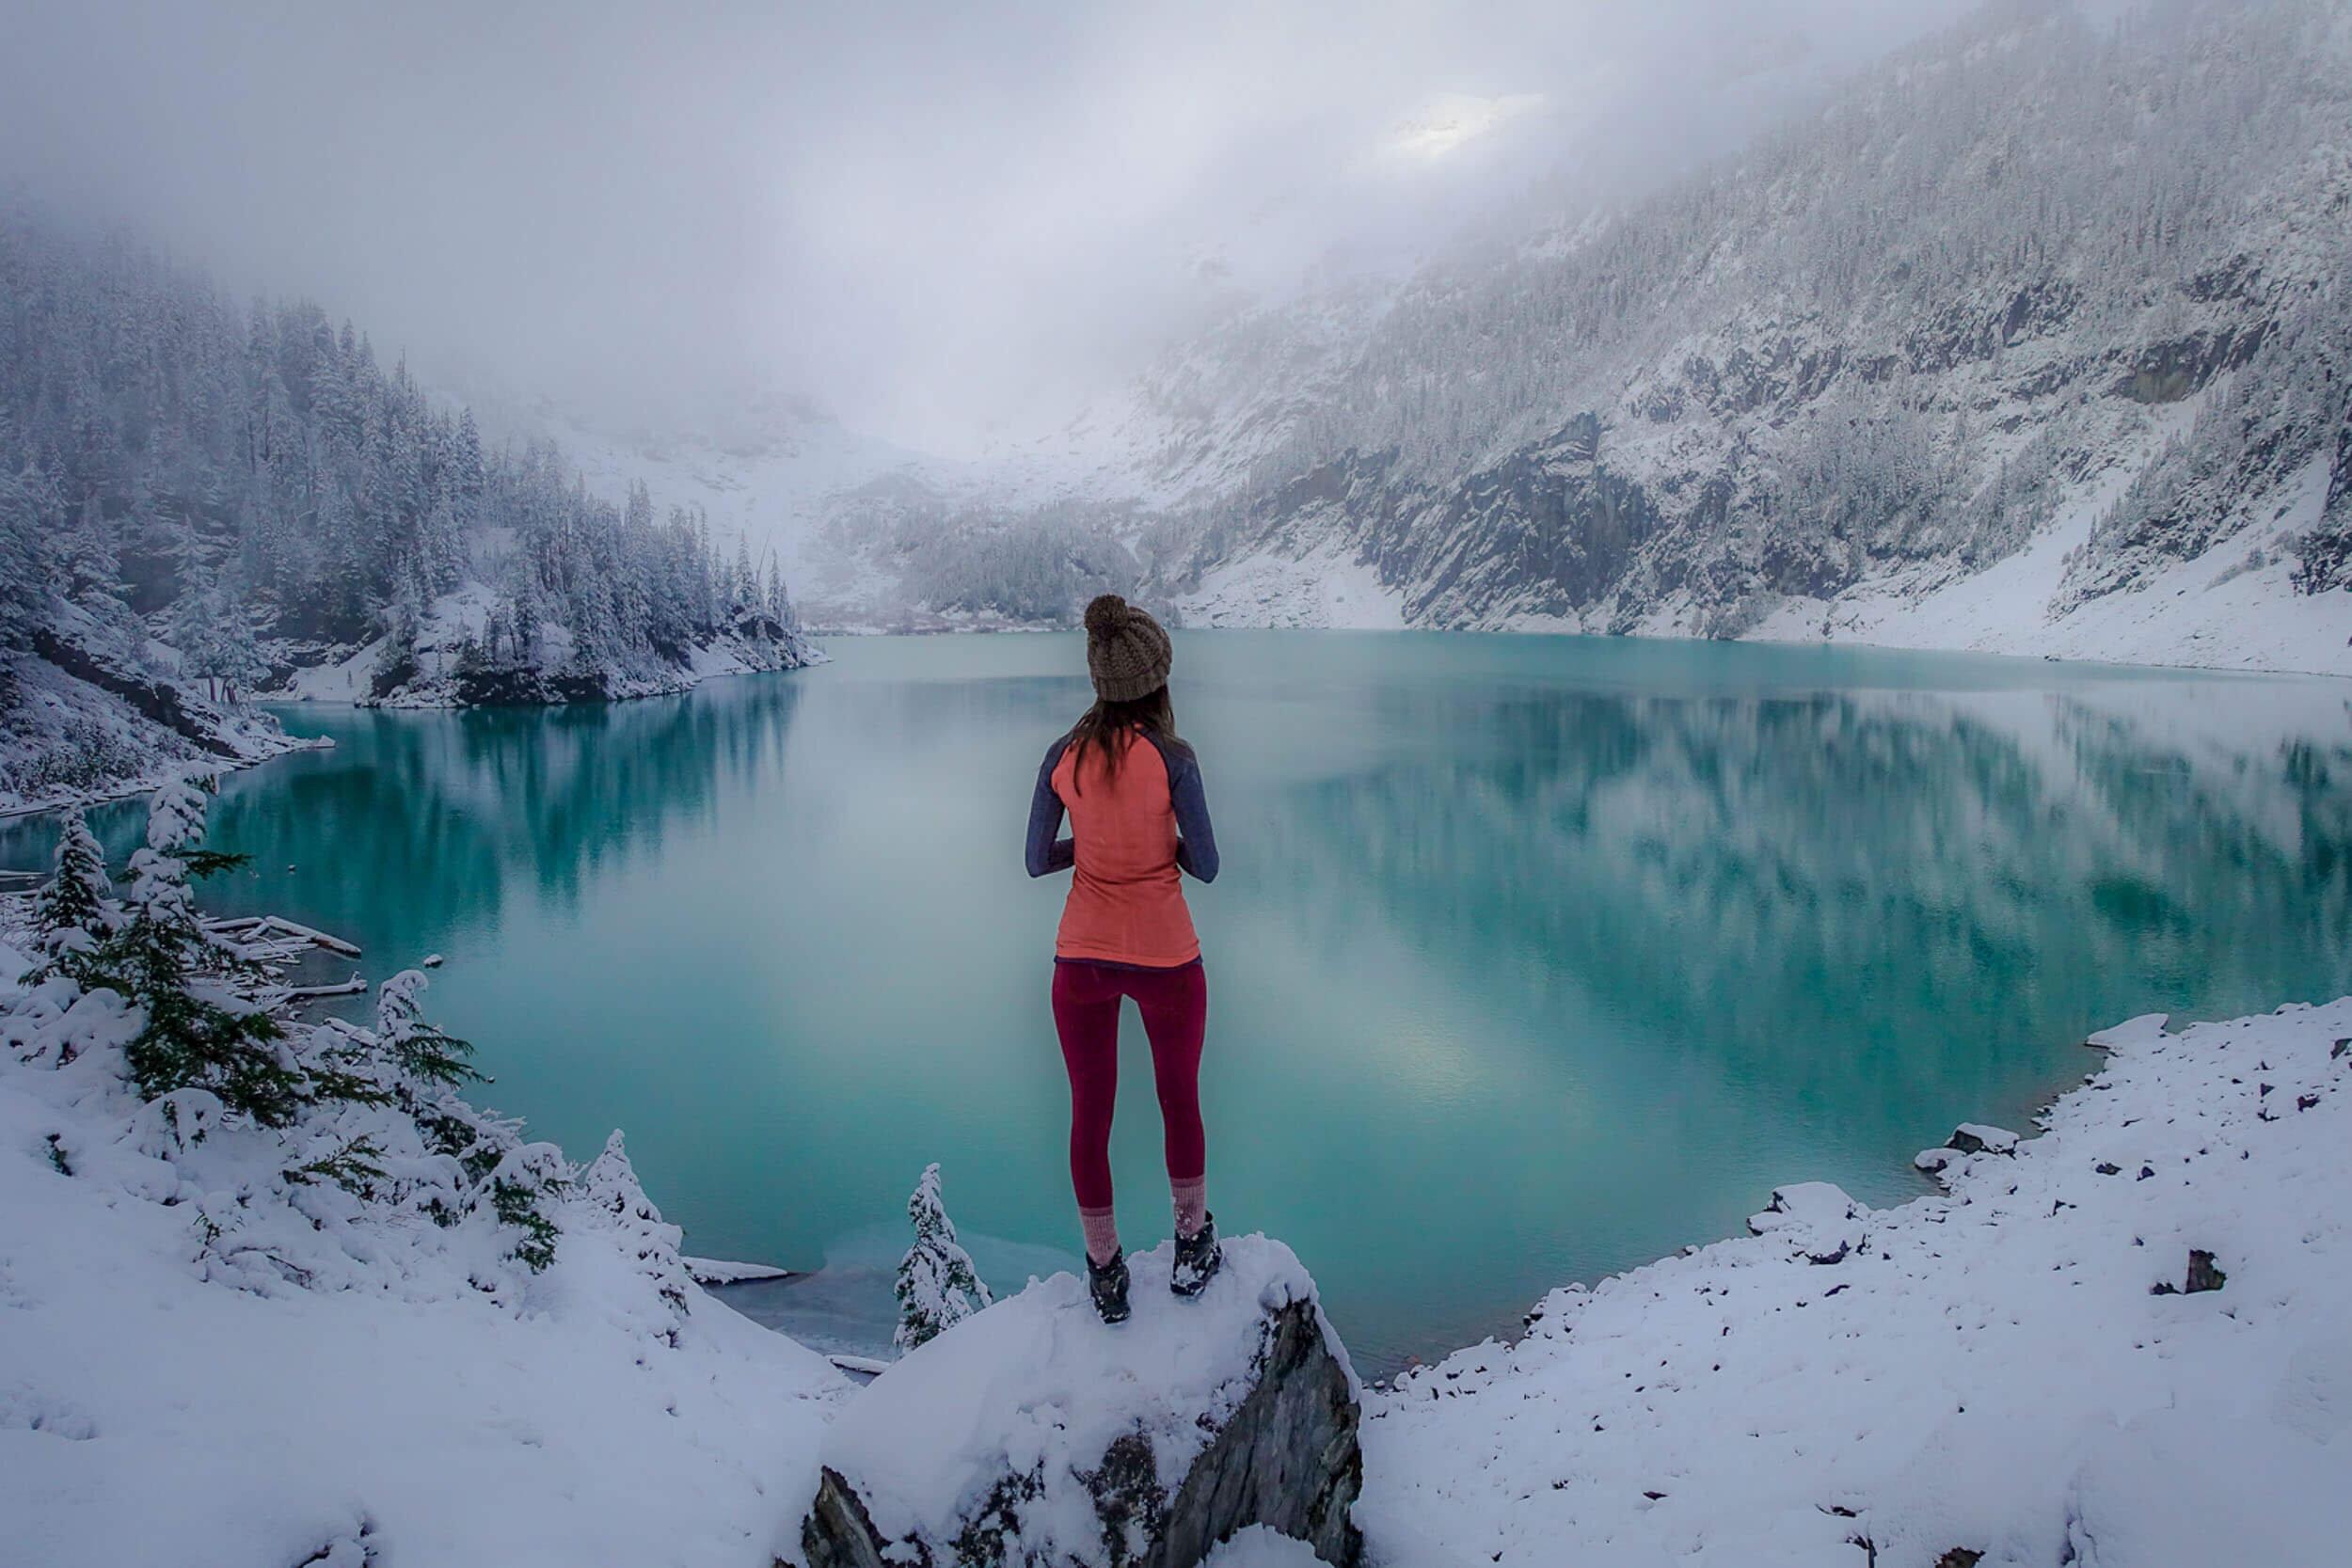 The first snow at Blanca Lake in Washington.